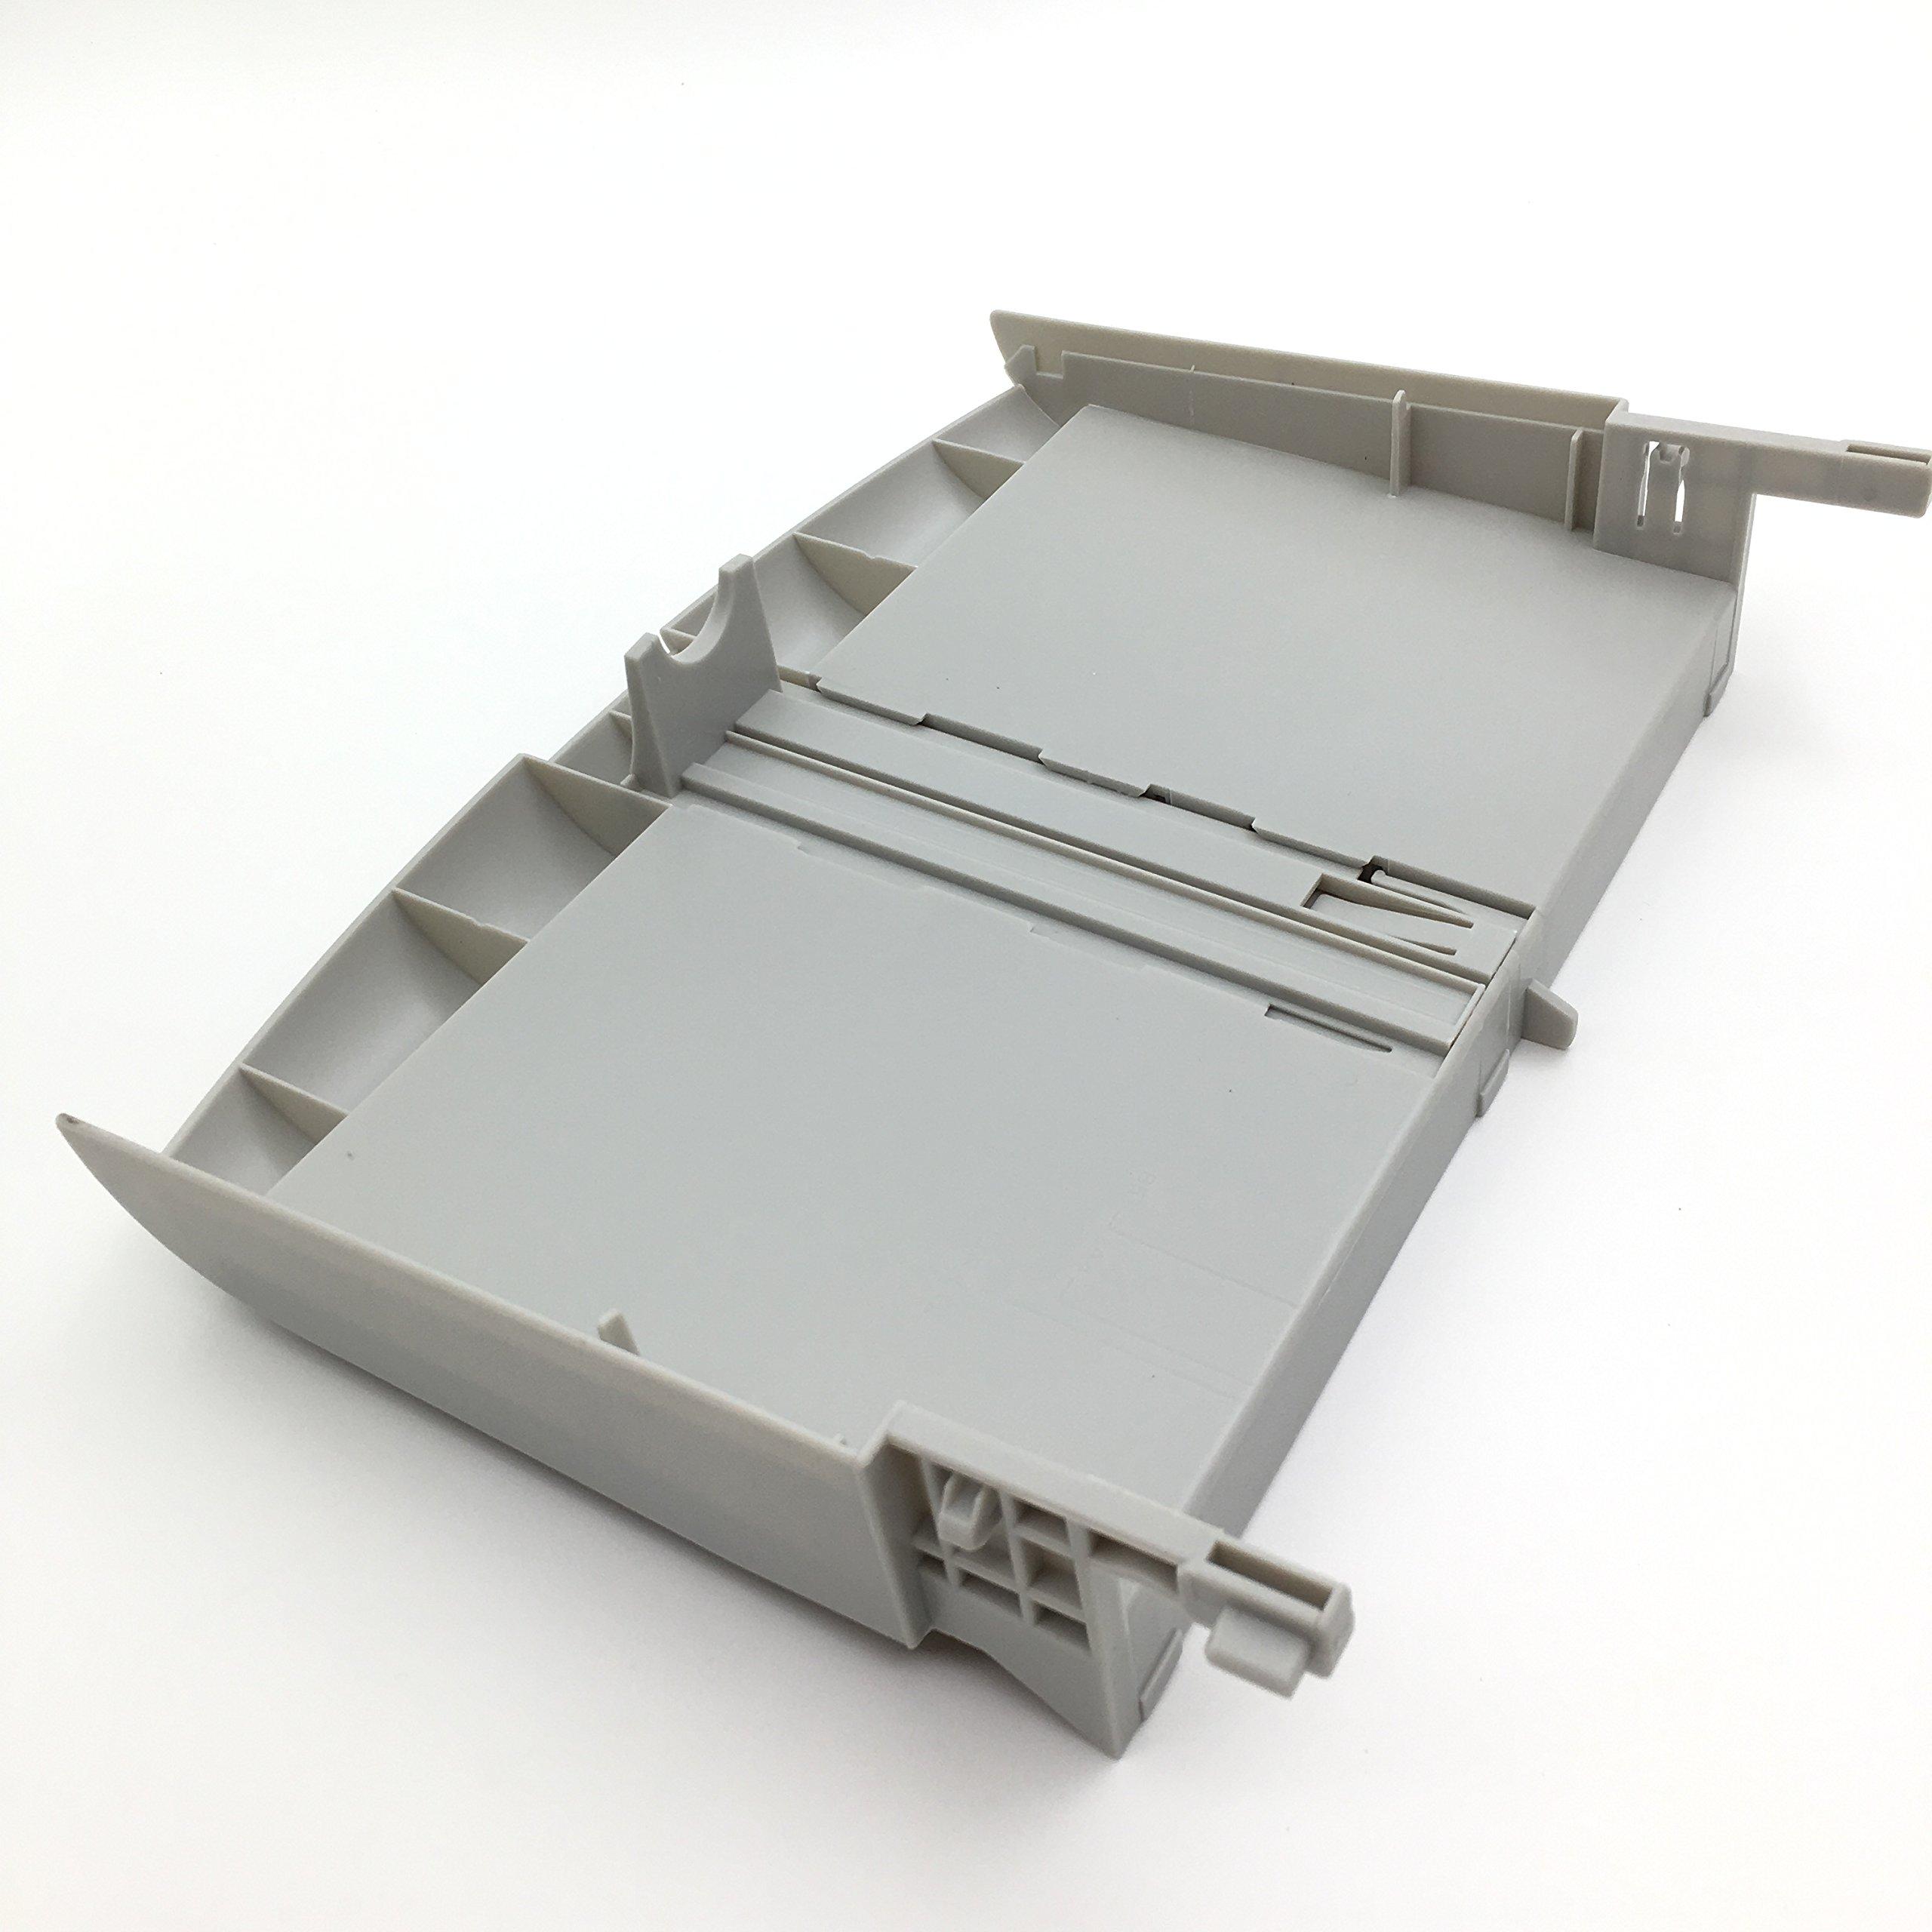 OKLILI RG0-1121-000 RG0-1013-000 RM1-0553 RM1-0554 Paper Input Tray for HP 1000 1200 1220 1300 1150 3300 3310 3320 3330 3380 by OKLILI (Image #2)